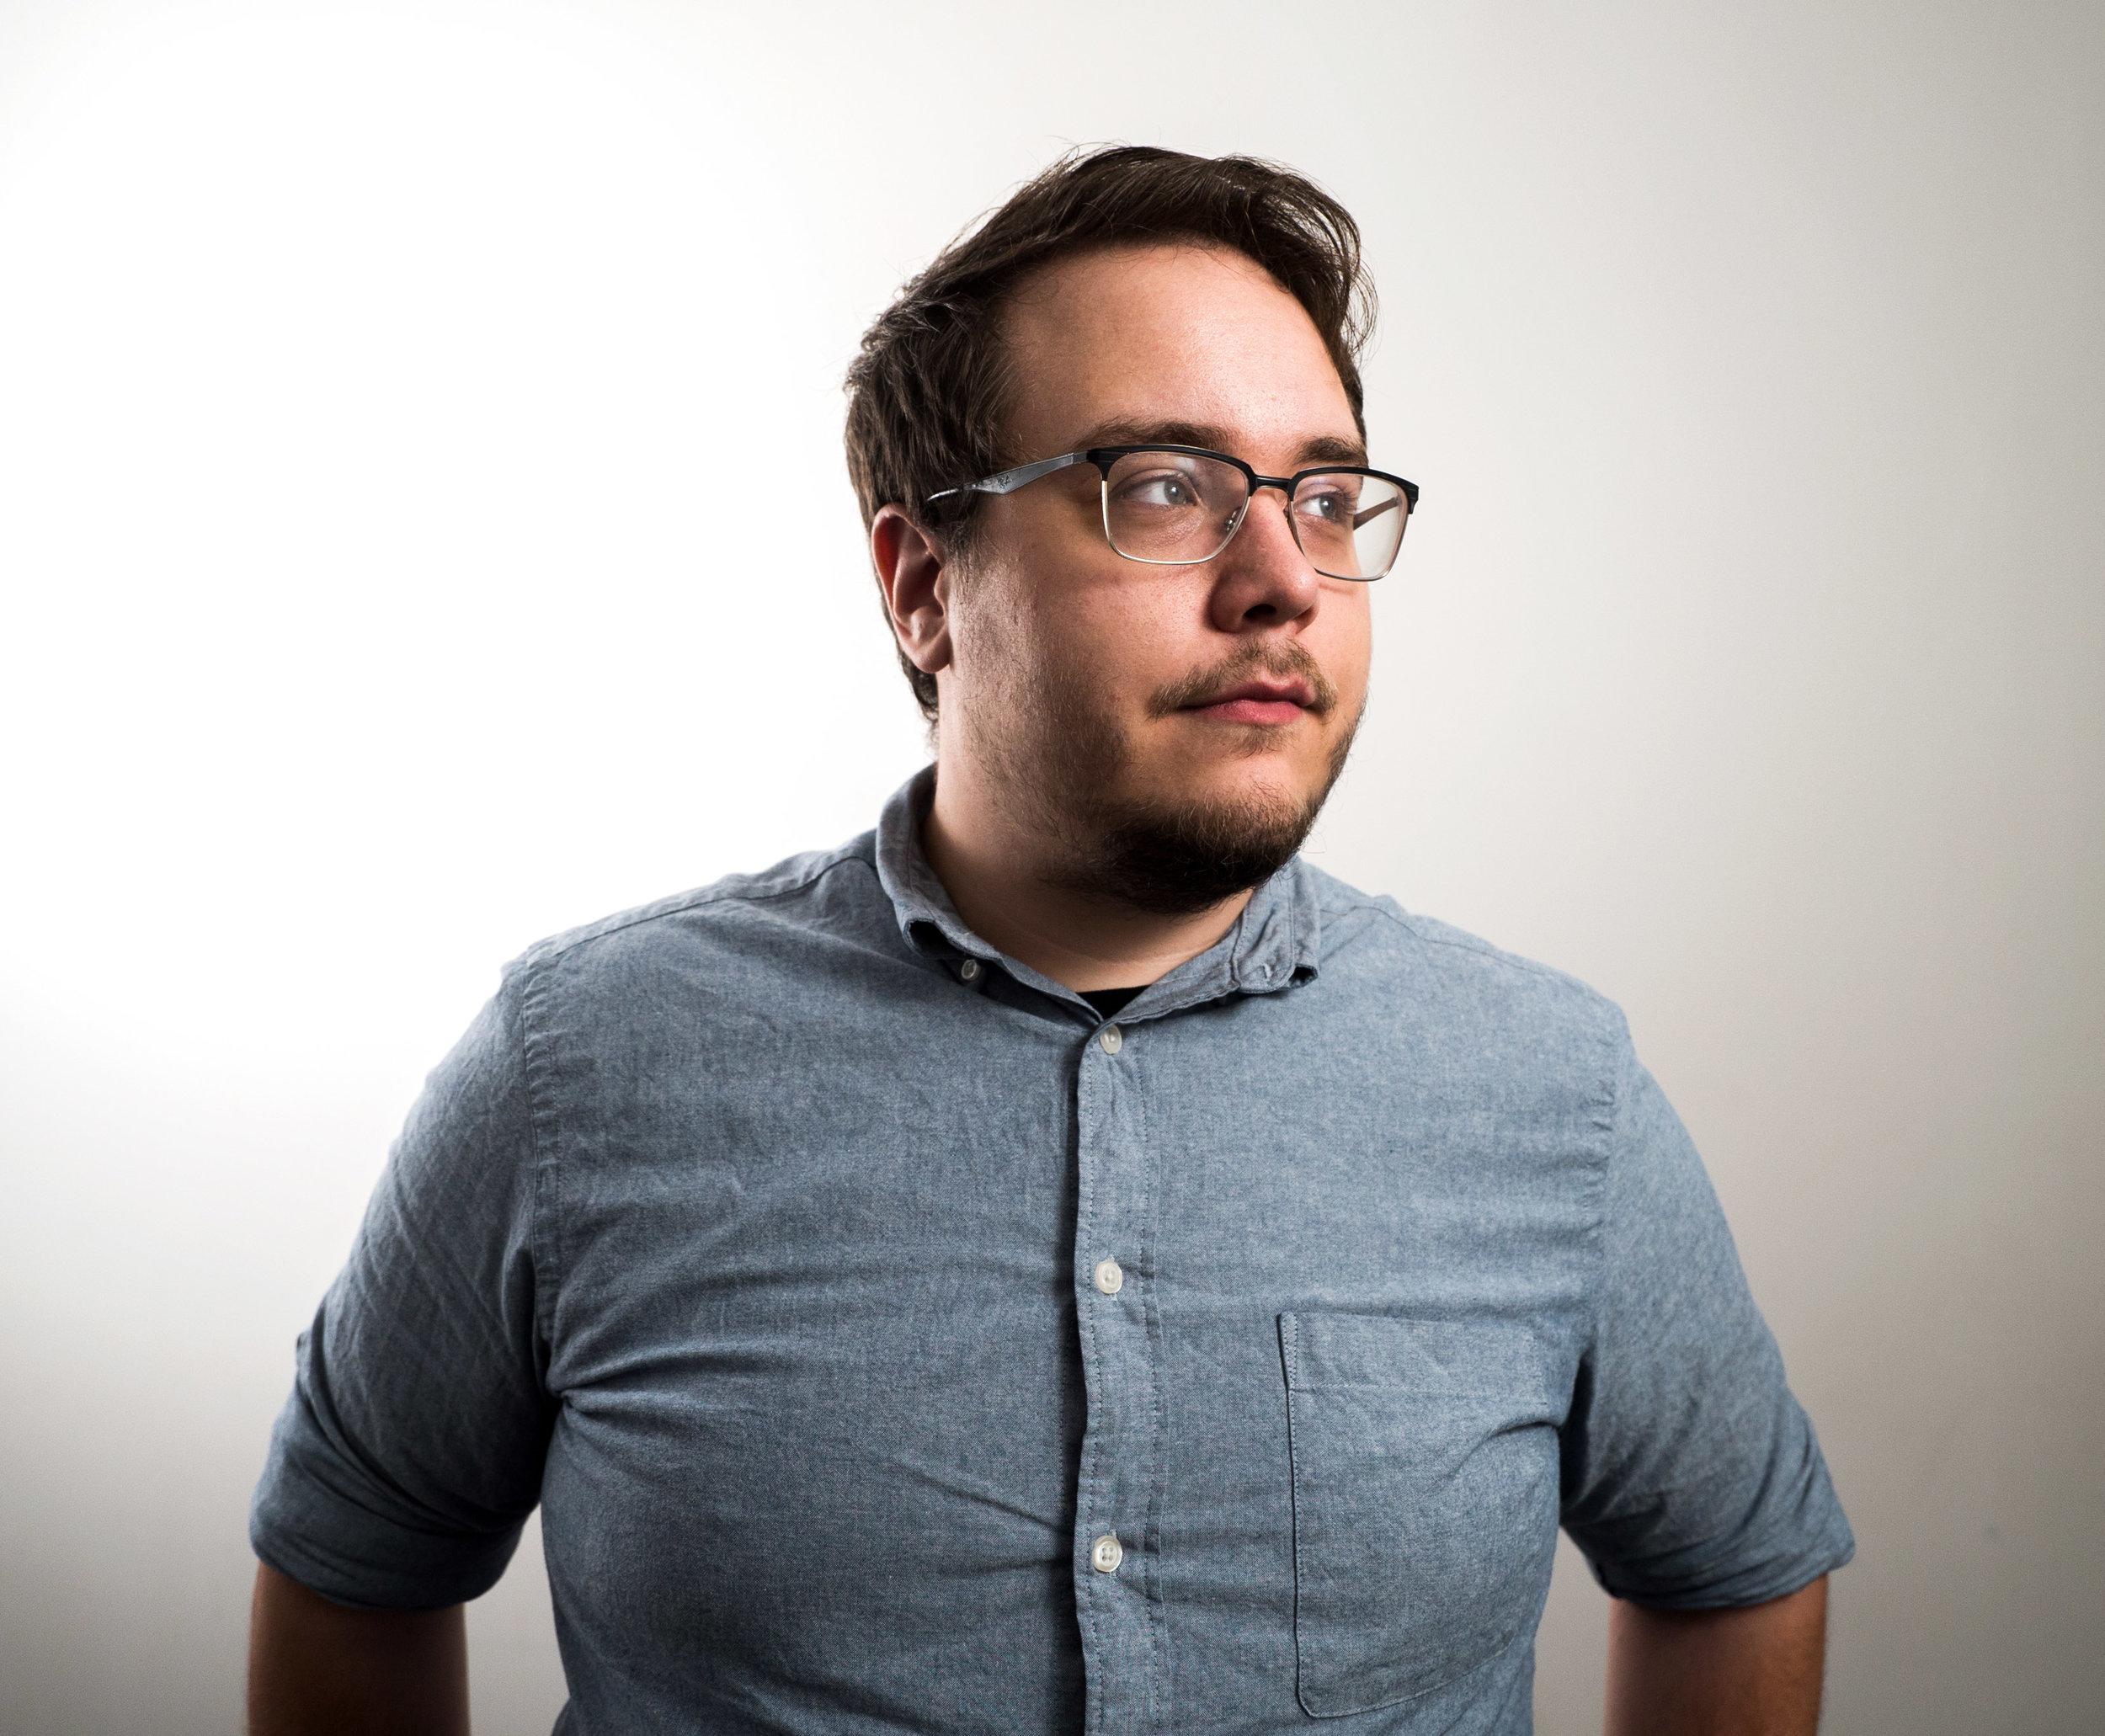 Derick Lingerfelt - Videographer at Elevate Media